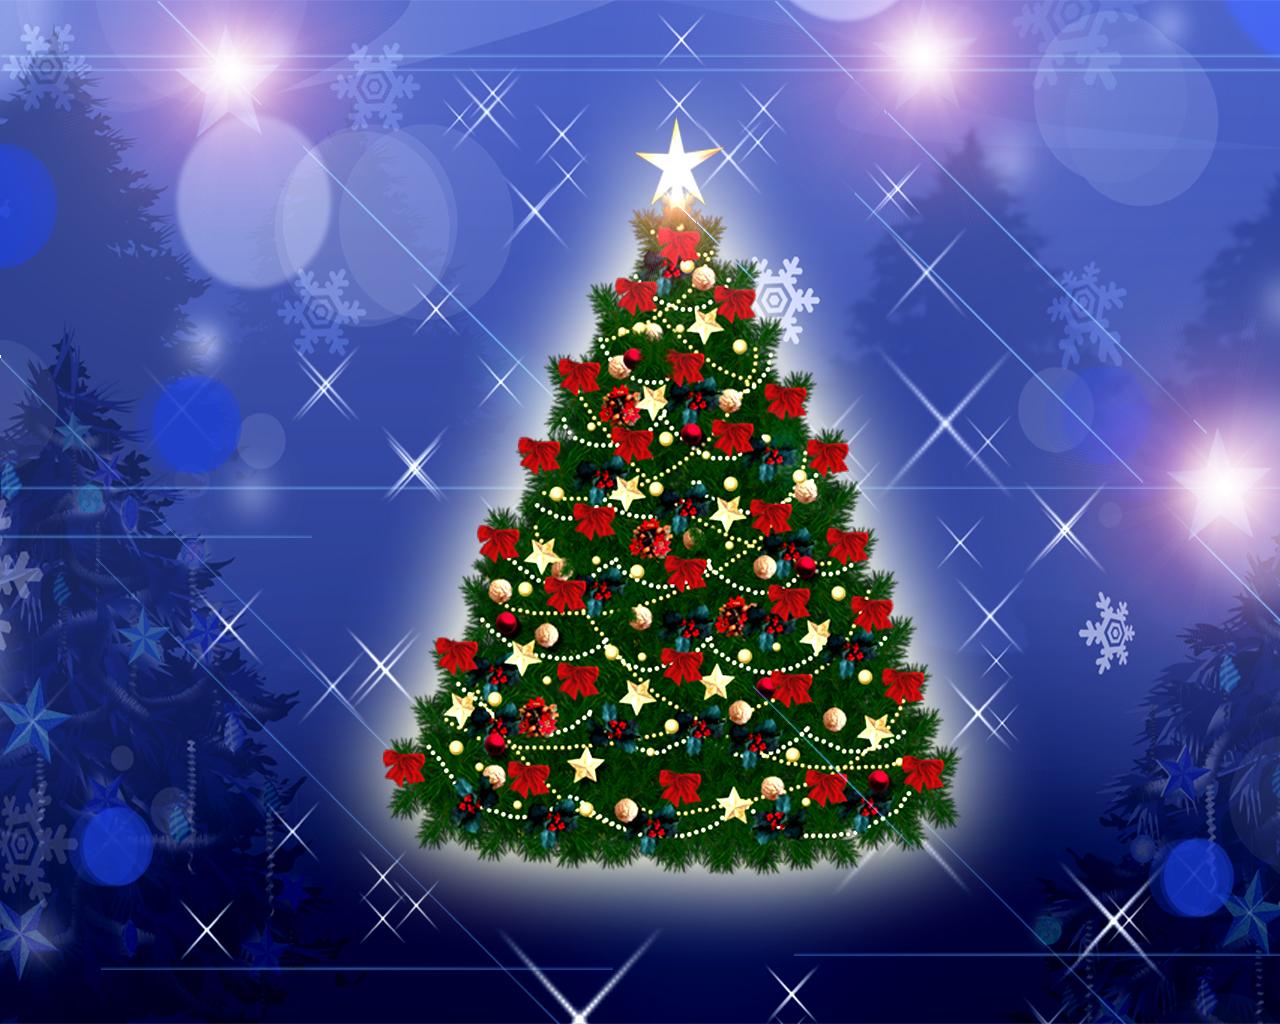 3507 Christmas Snow Desktop Wallpaper   WalOpscom 1280x1024